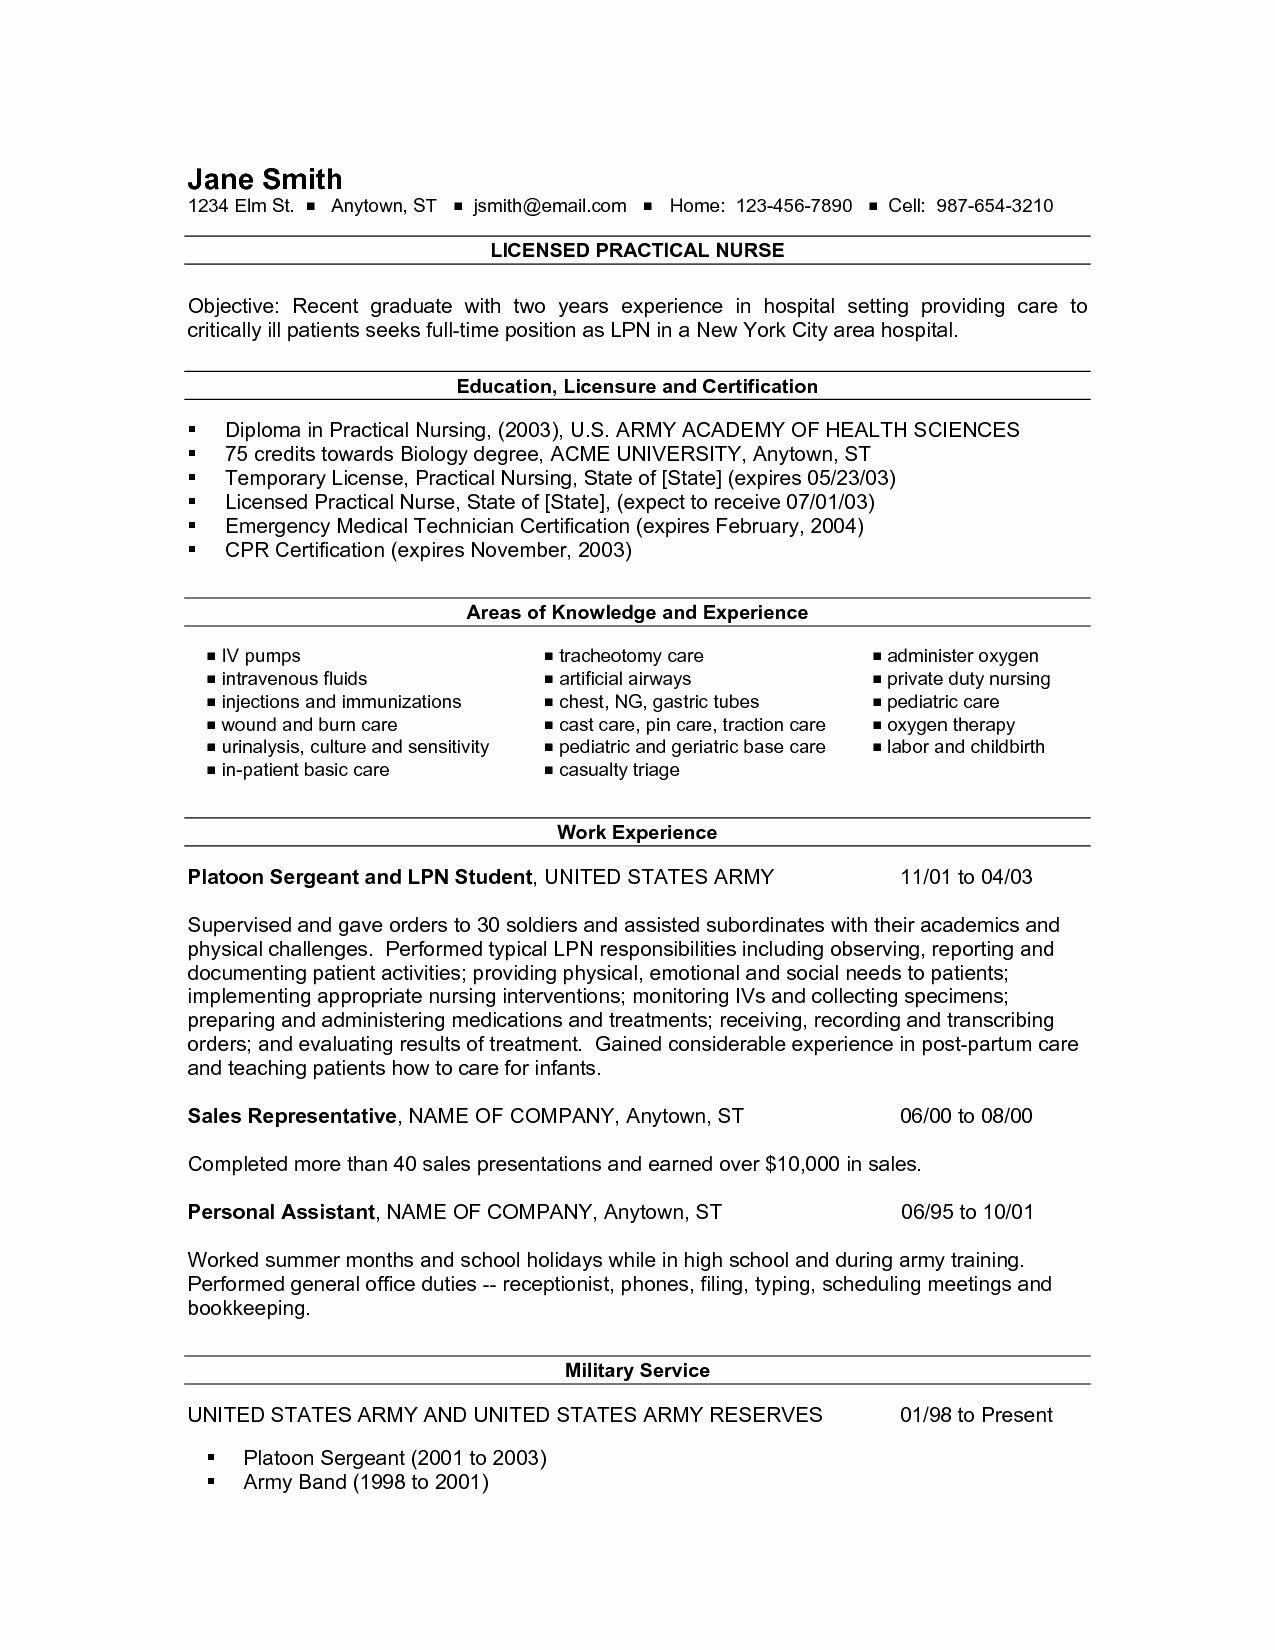 New Graduate Nurse Resume Examples Elegant New Grad Lpn Resume Resume Ideas Nursing Resume Template Lpn Resume Nursing Resume